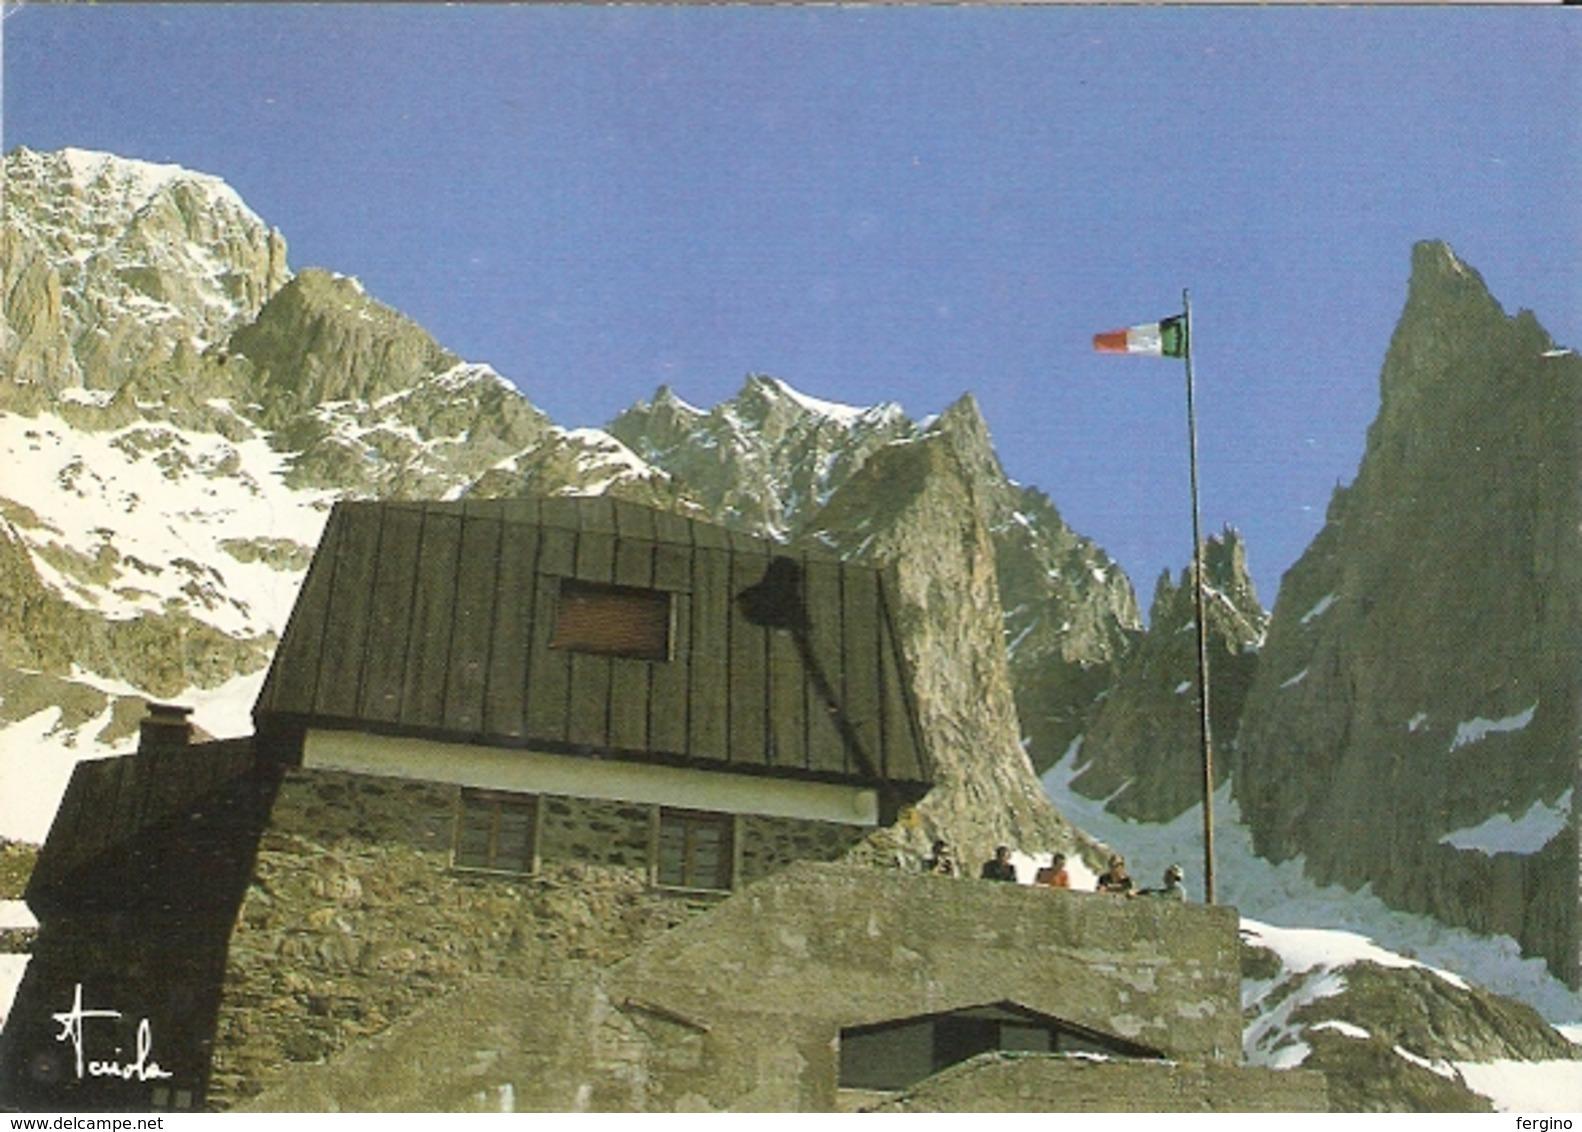 379/FG/19 - ALPINISMO - CHATELET (COURMAYEUR): Rifugio Franco Monzino - Italia